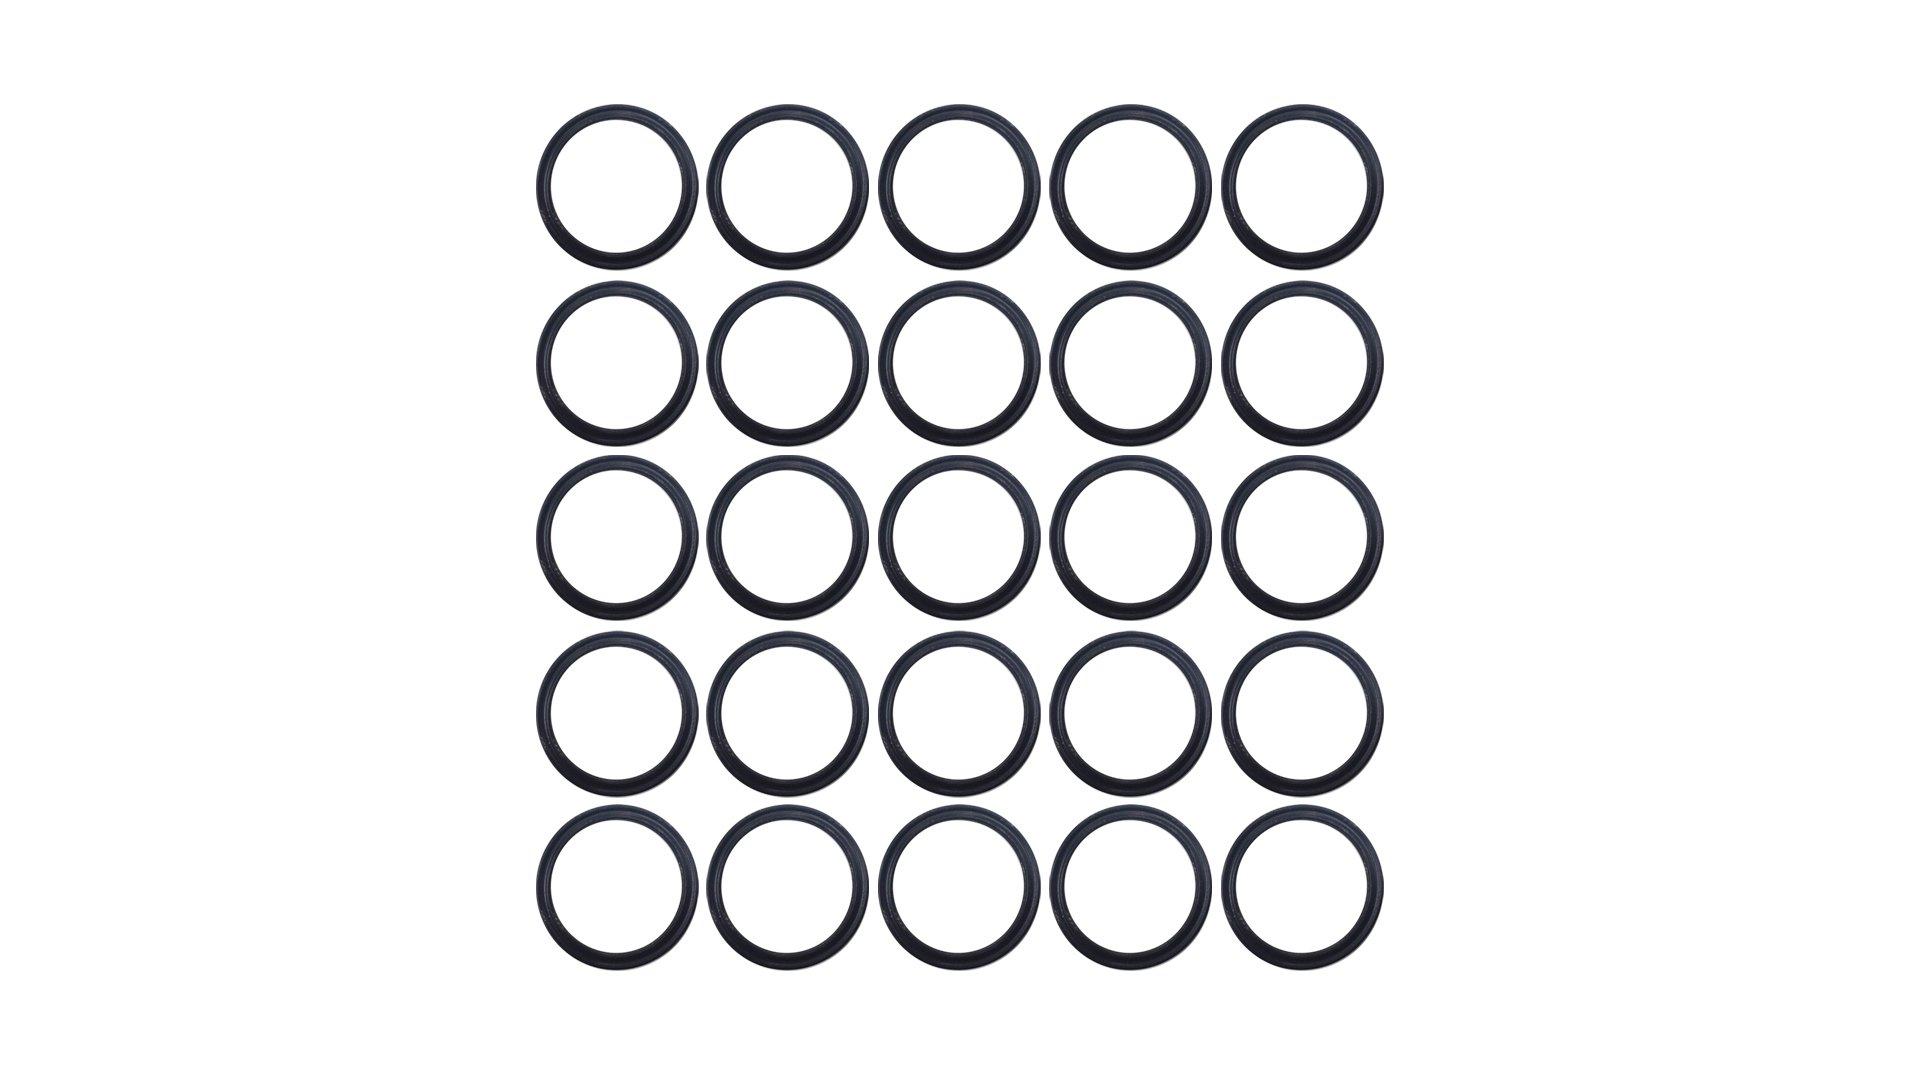 Sterling Seal XP75VIT136X25 136 75D Quad Ring, Viton/FKM, Black (Pack of 25)